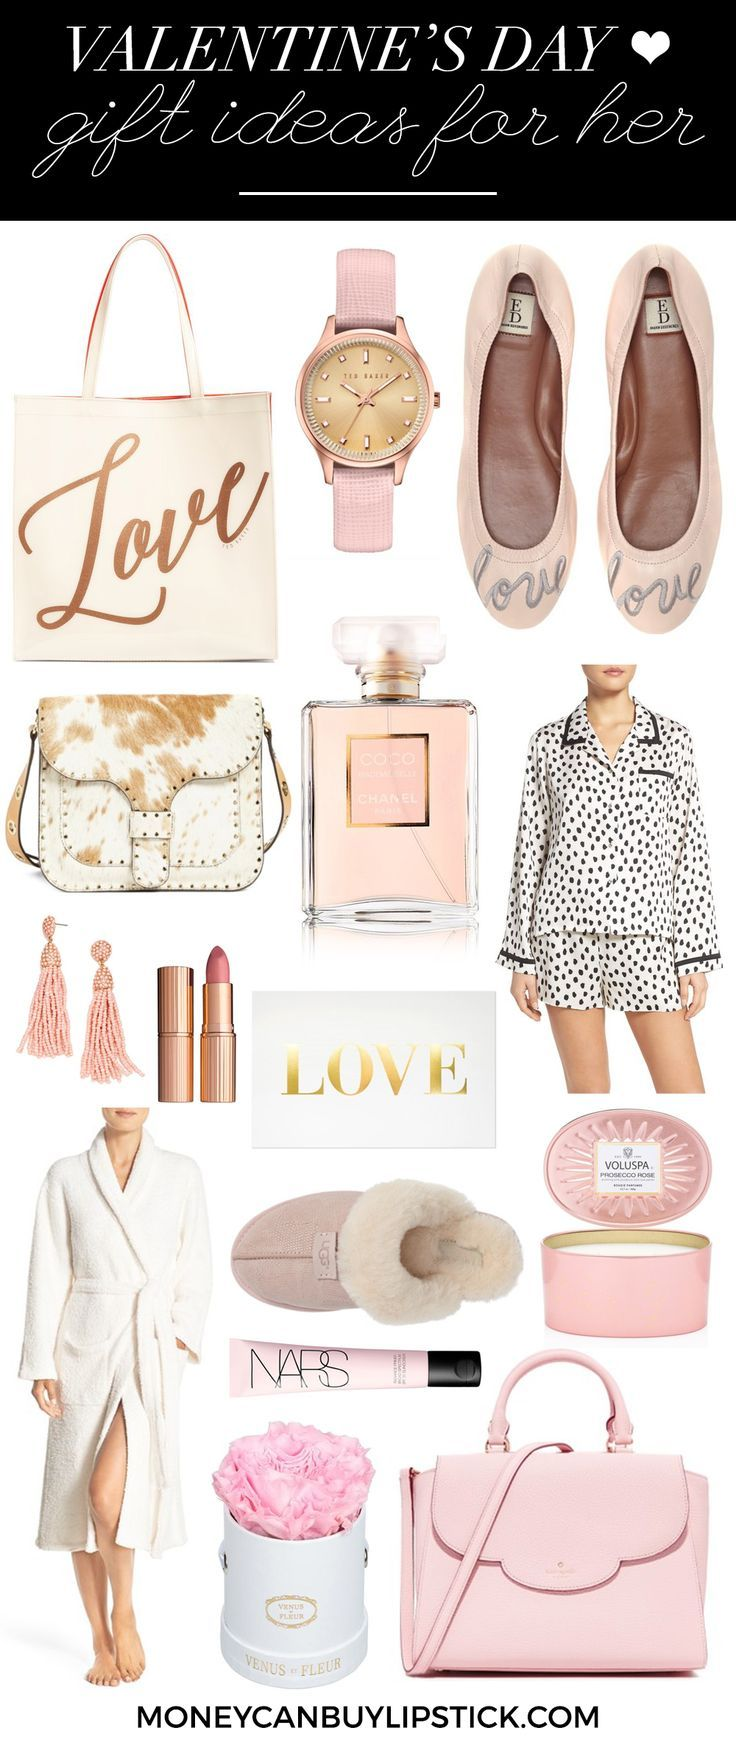 Valentine's Day | Gifts For Her | Valentine's Day Gifts For Her | Galentines Day | Gift Ideas | Gift Ideas For Her | Pink Gift Ideas | Luxury Gifts | Pretty Gifts | VDay | Valentine